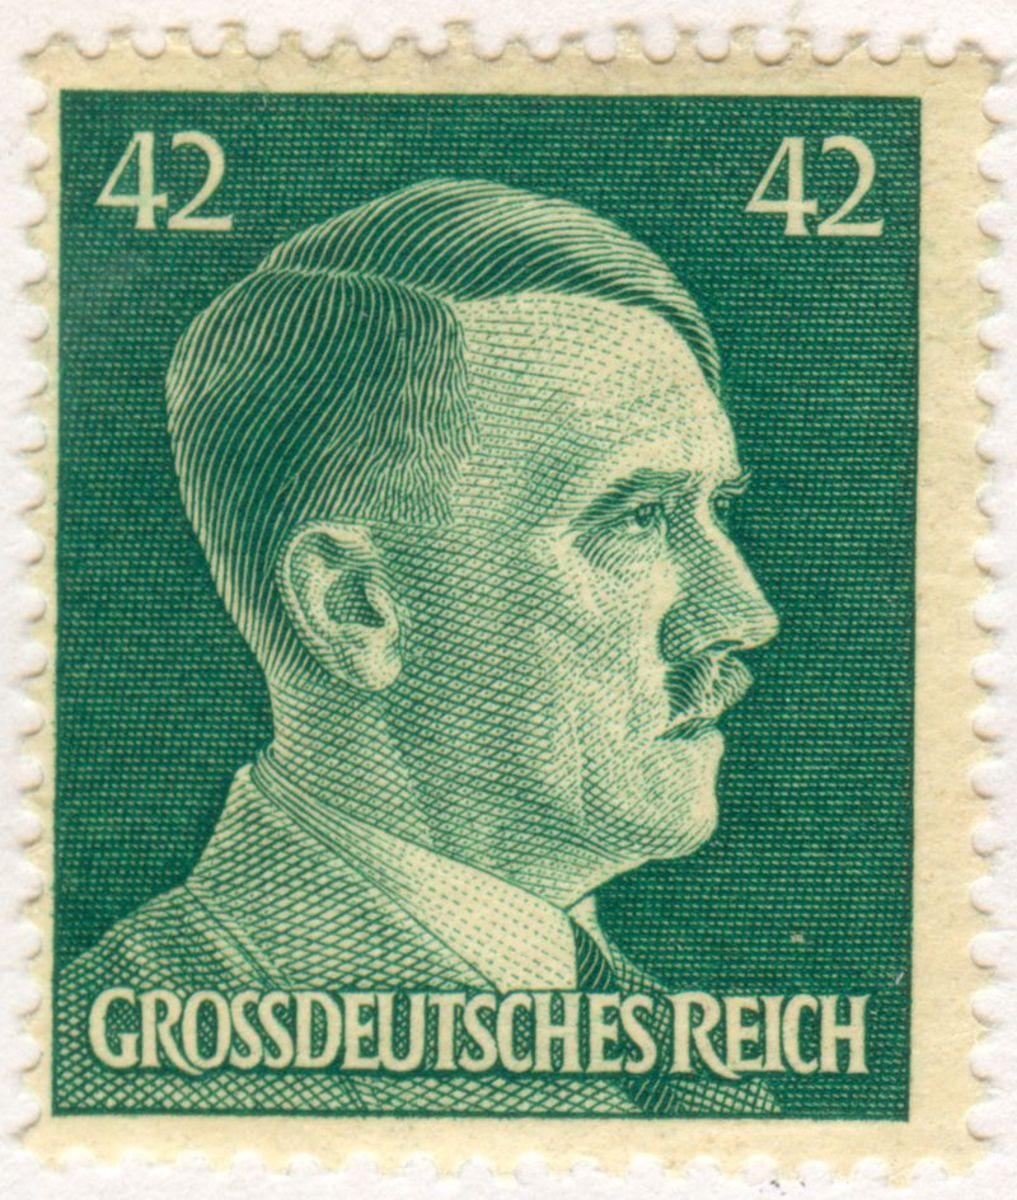 Hitler Stamp.